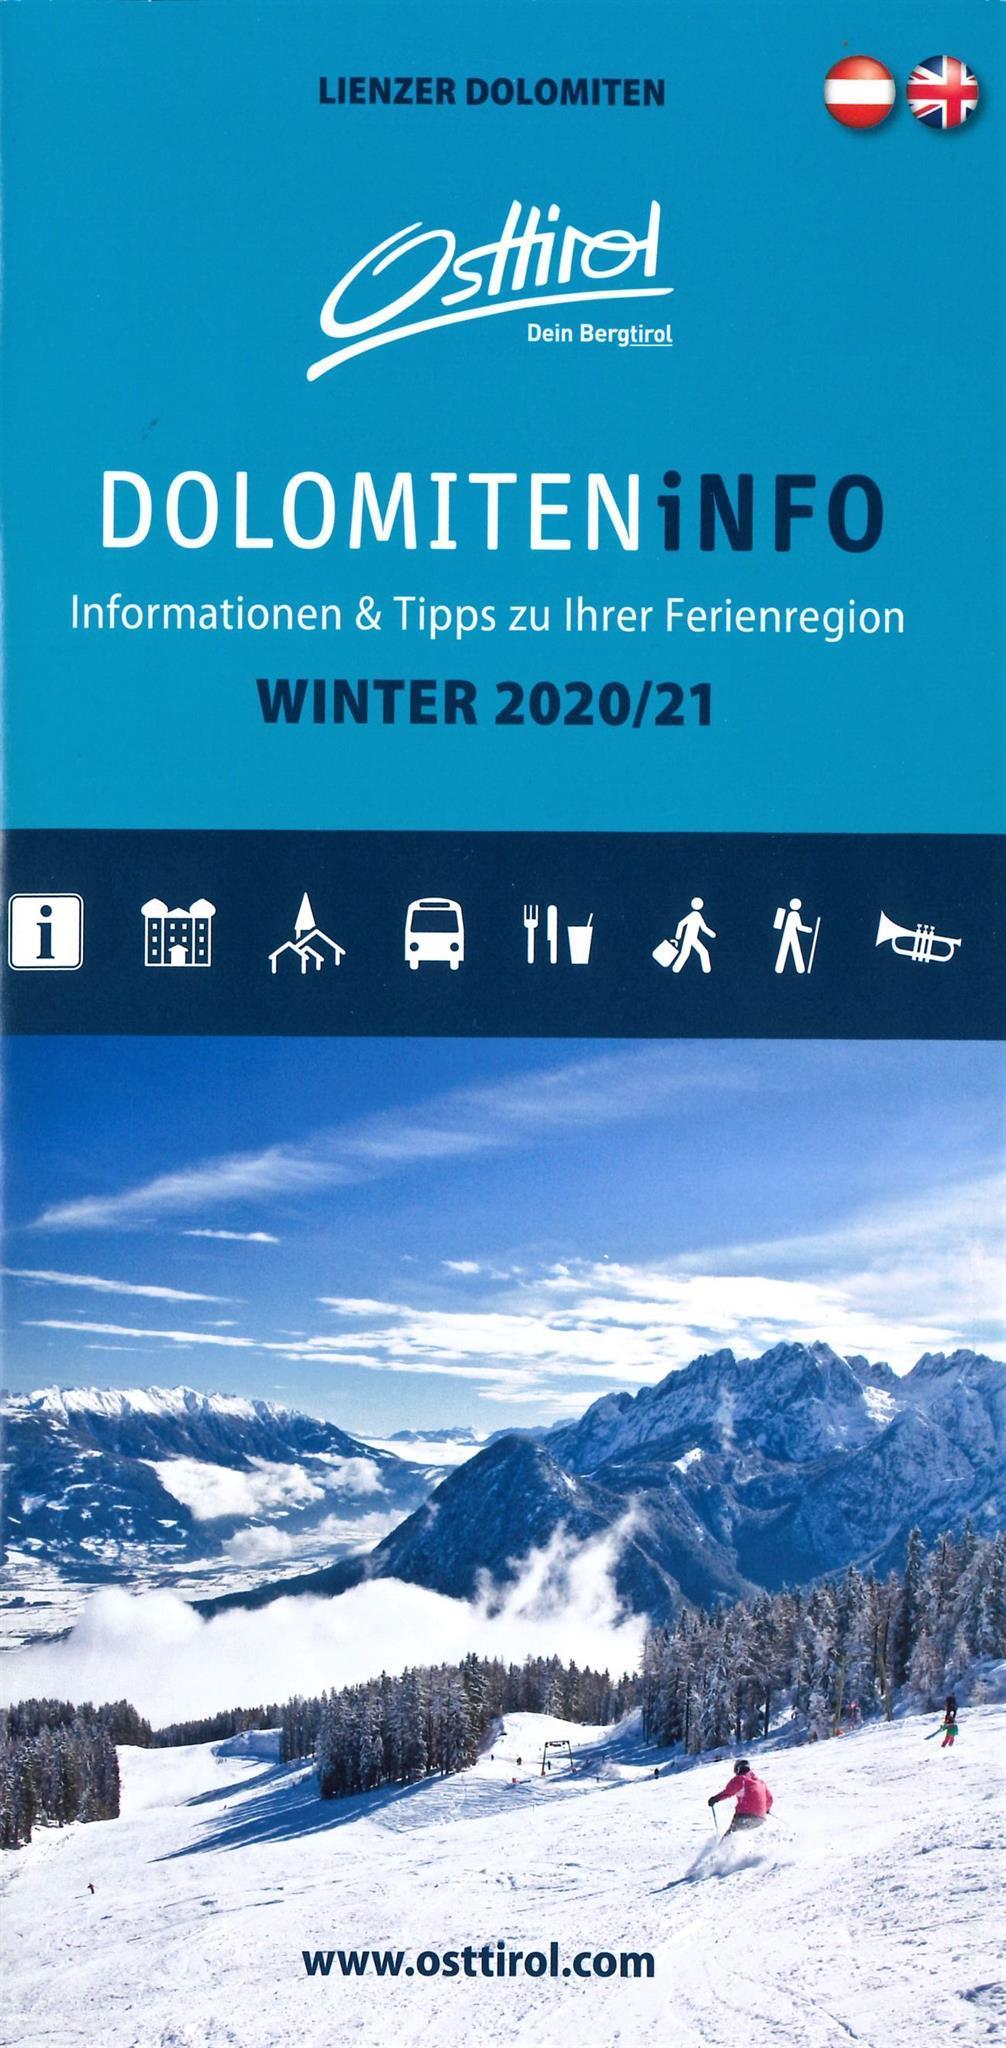 Cover-Dolomiteninfo-Winter-2020-21.jpg